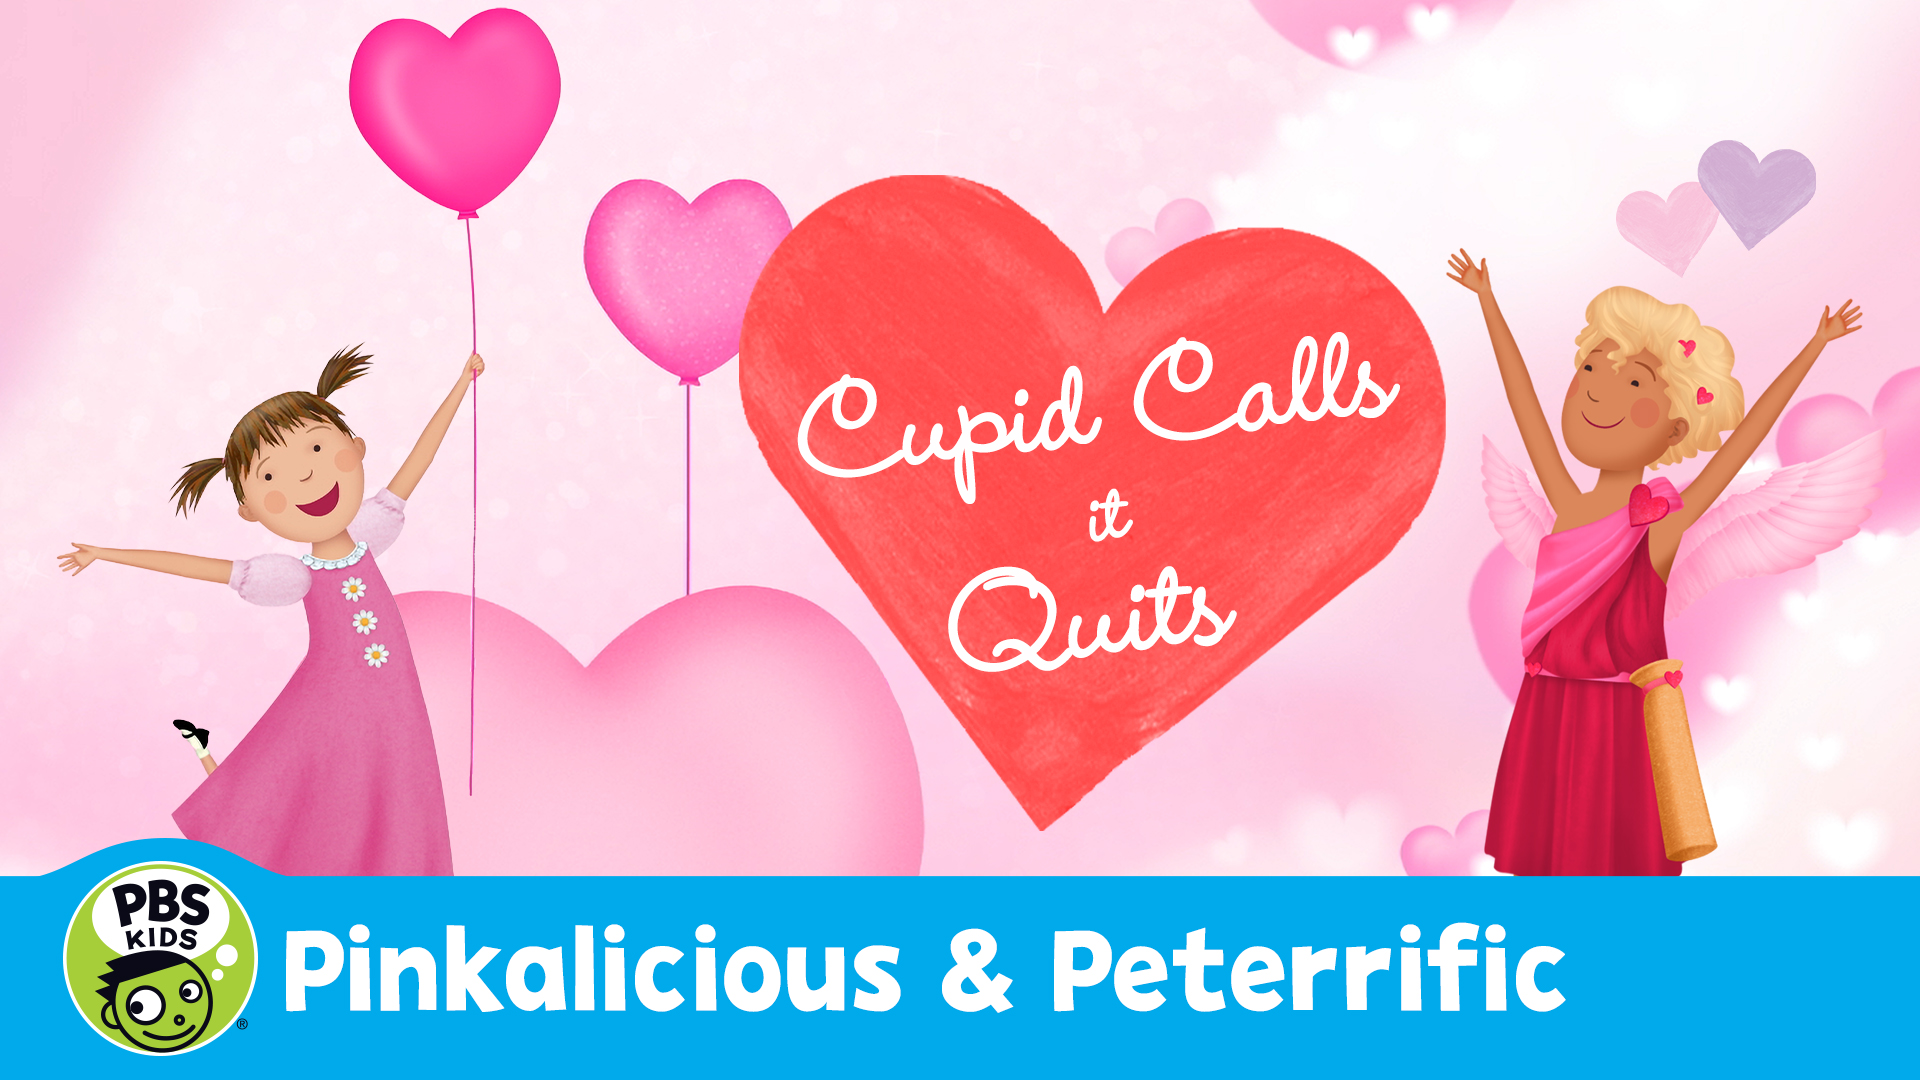 Pinkalicious & Peterrific: Cupid Calls It Quits